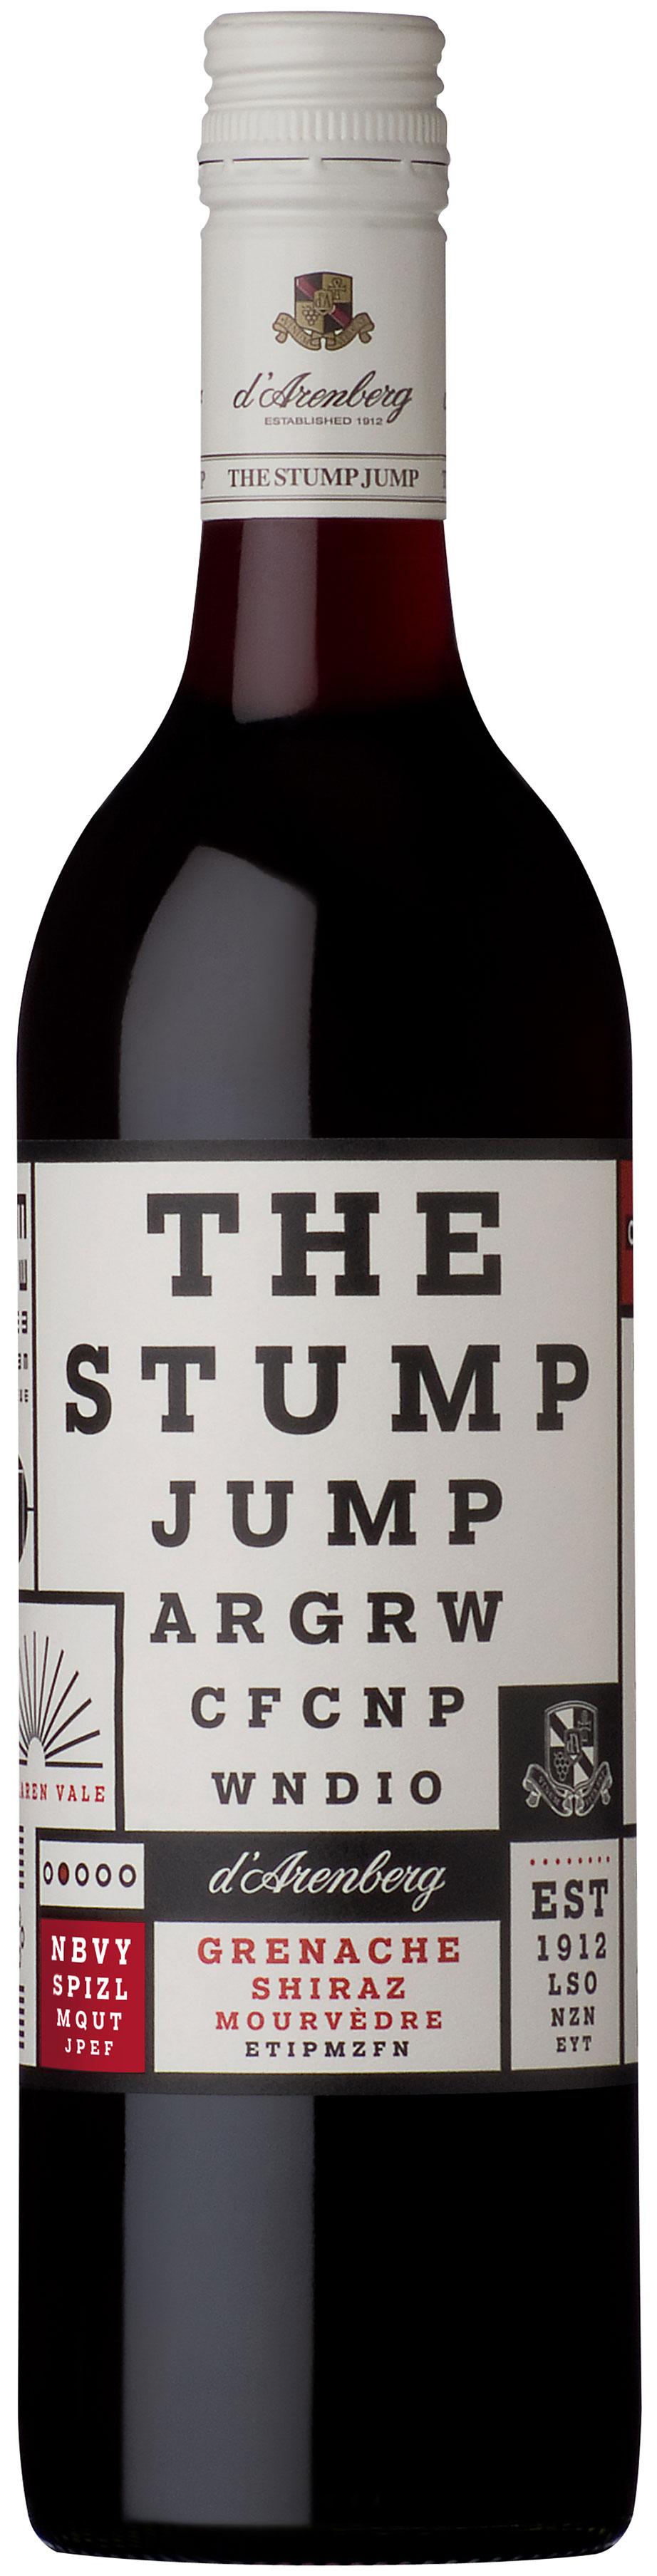 https://vinocorpperu.com/images/vinos/darenberg/the_stump_jump_grenache_shiraz_mourvedre_2016.jpg